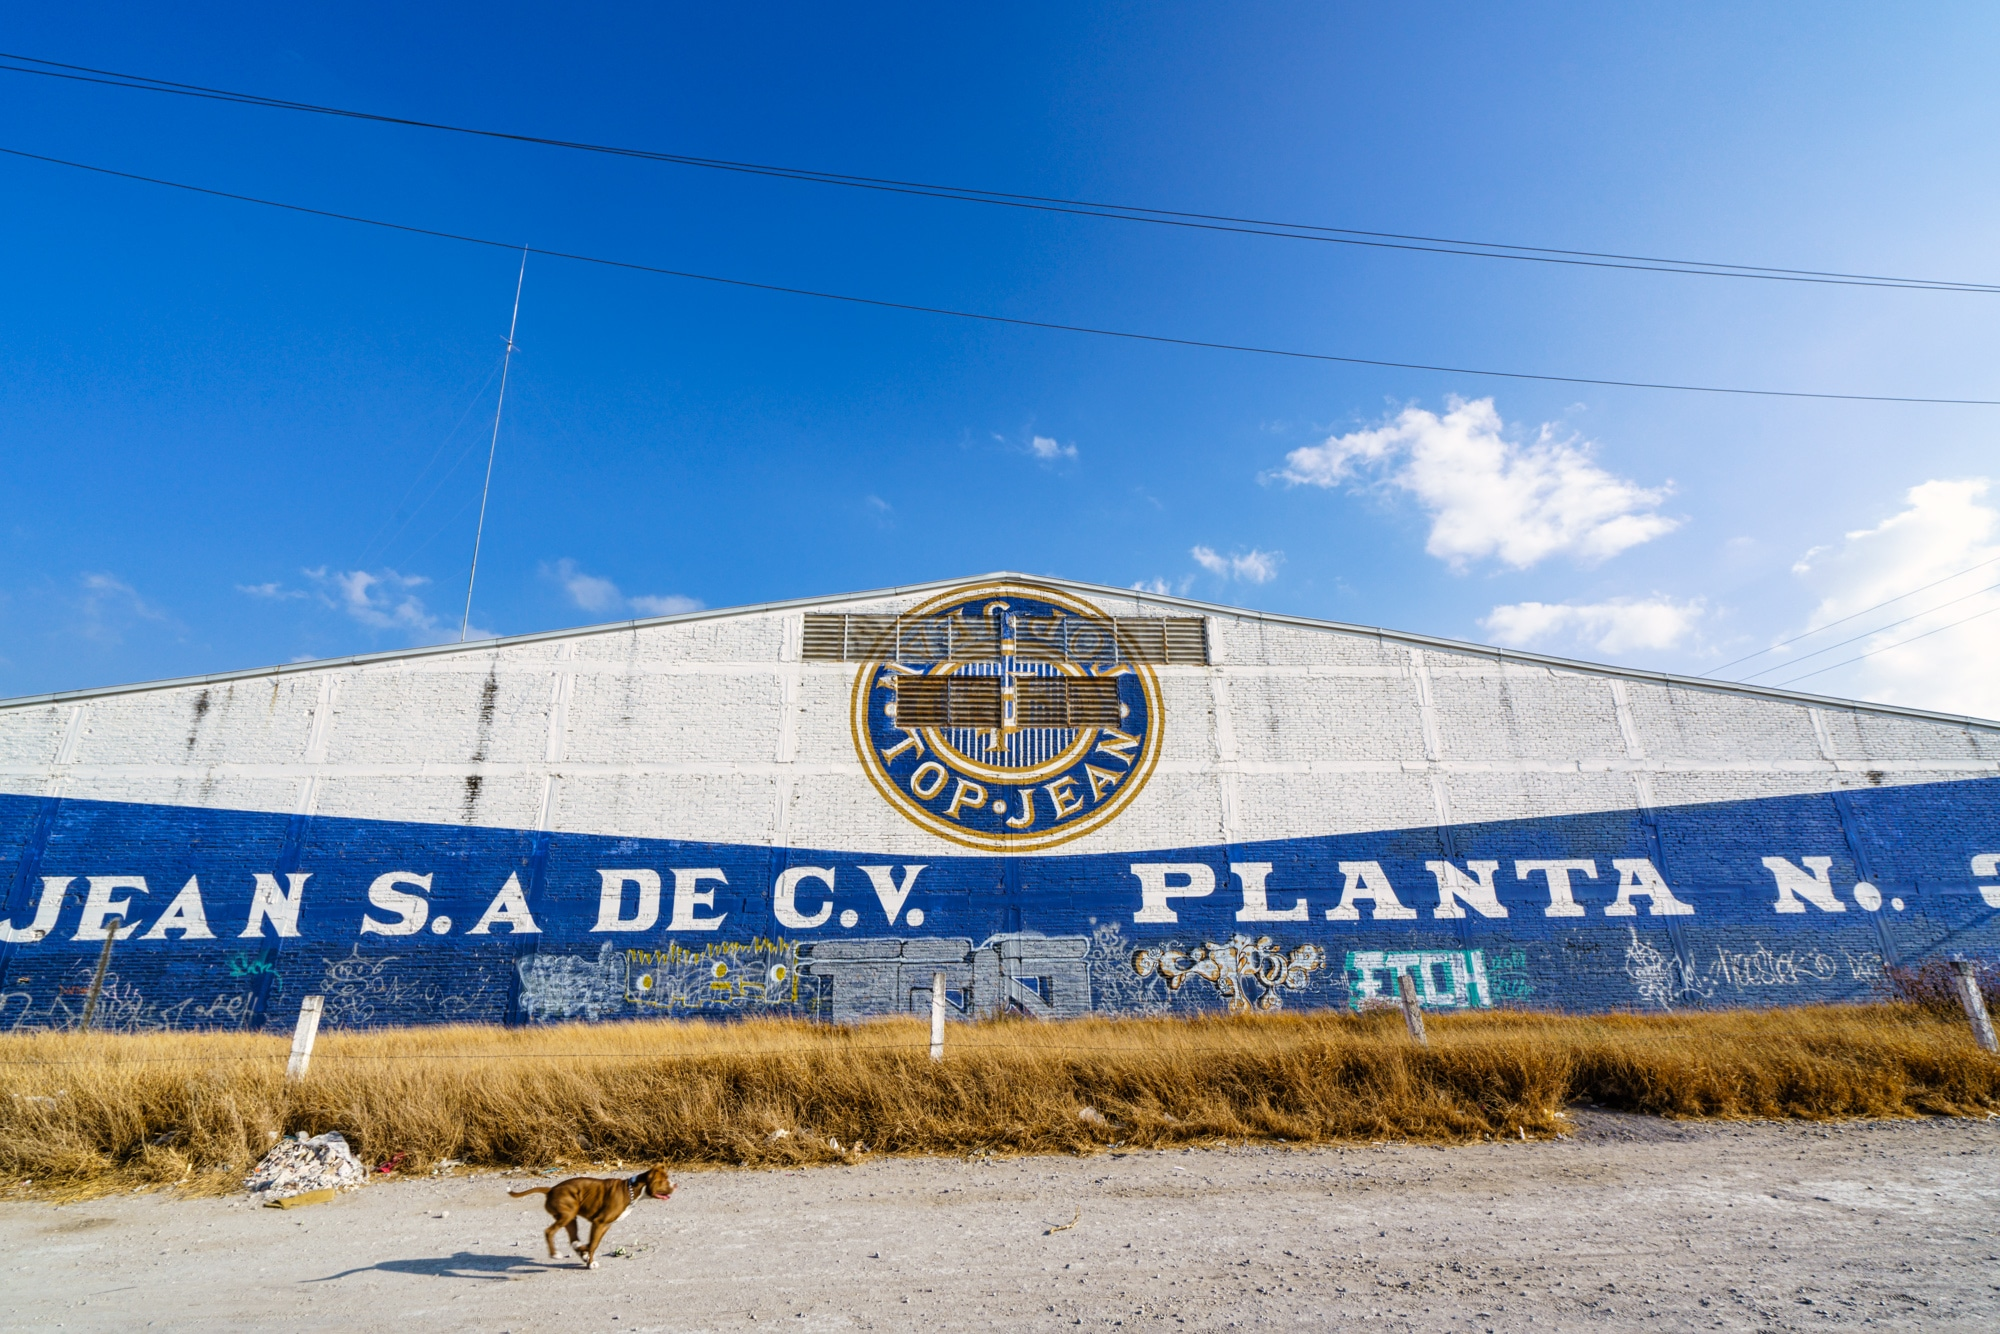 The sweatshops in Tehuacan